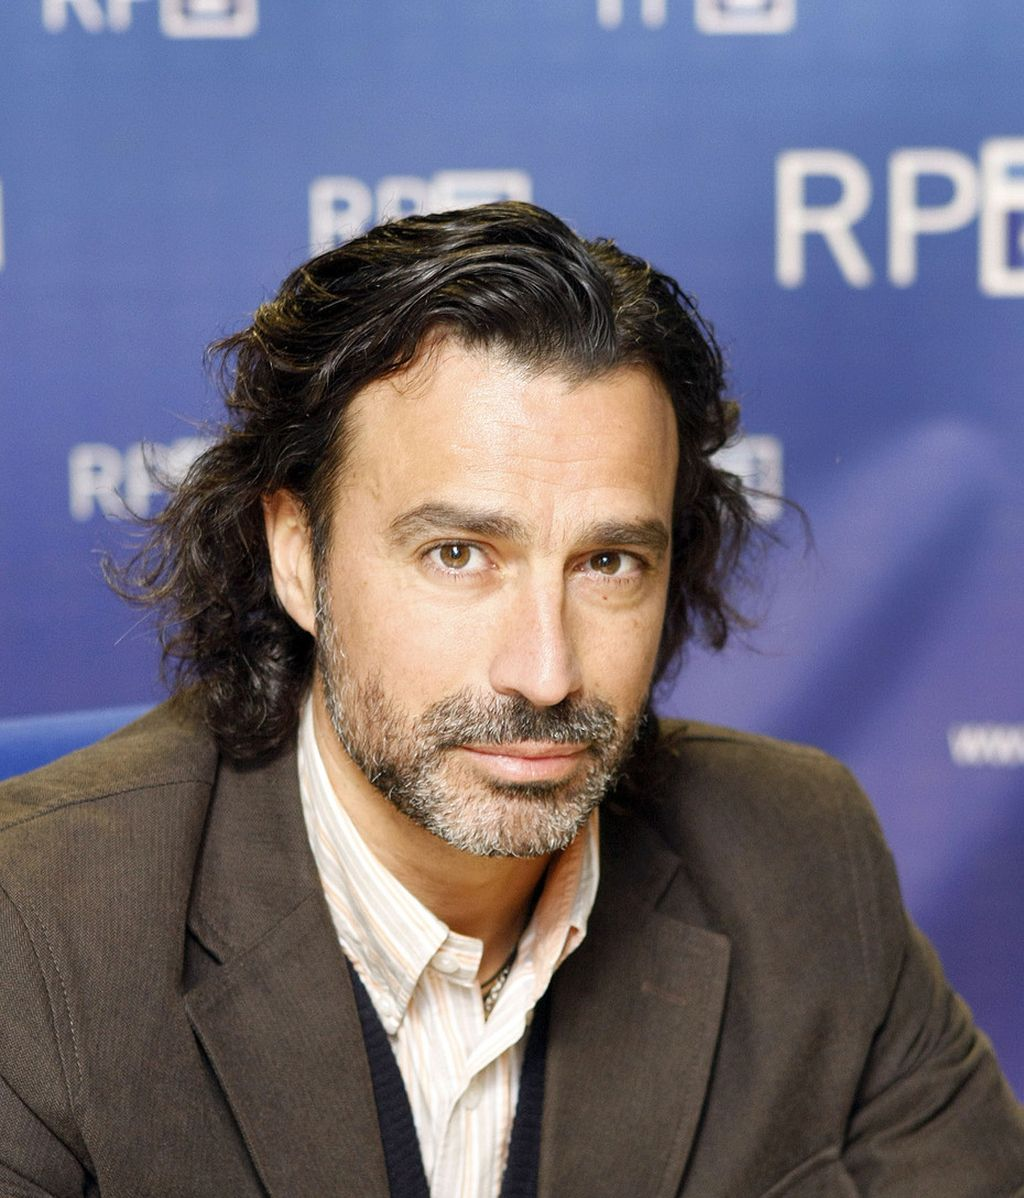 Antonio Virgili RTPA